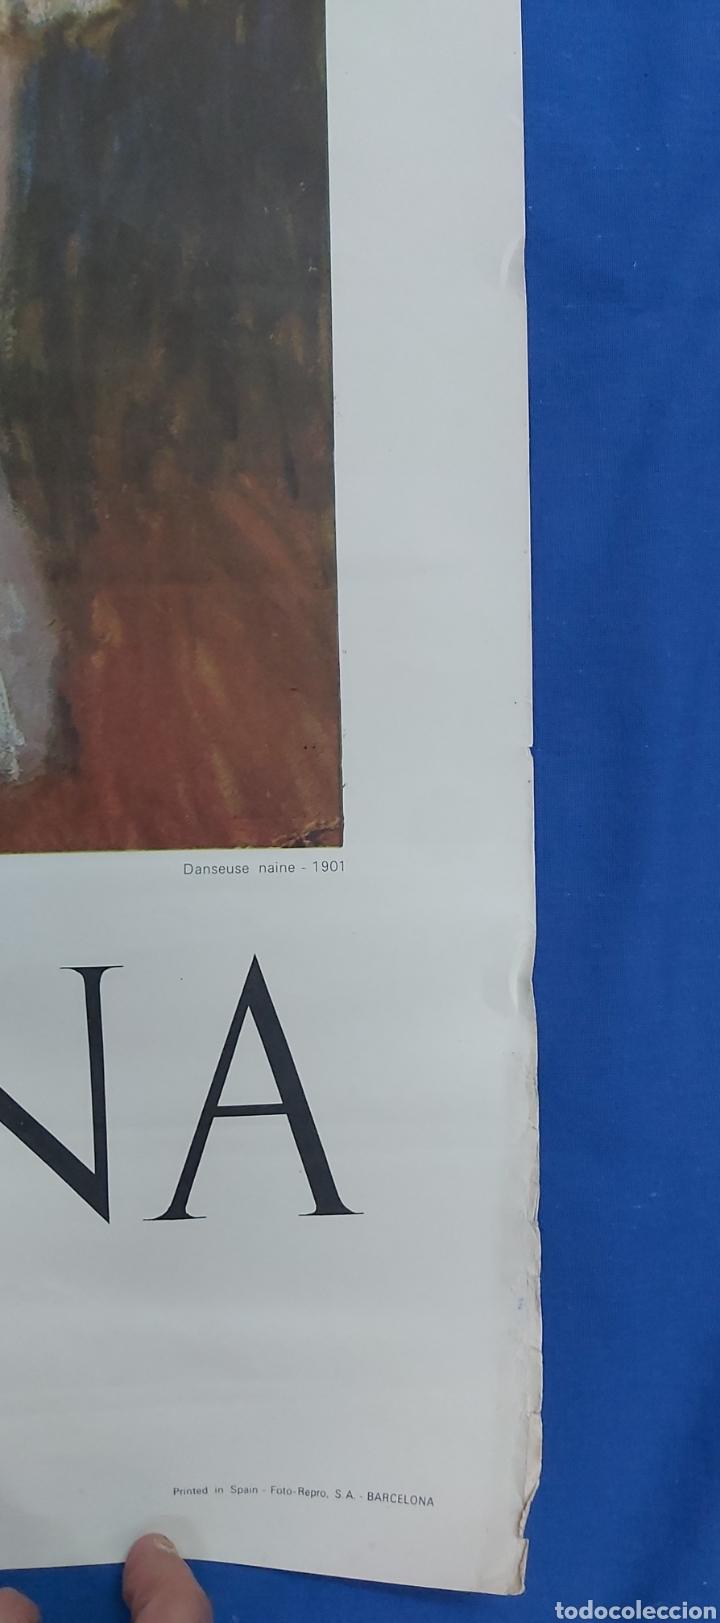 Carteles: DANSEUSE NAINE. CARTEL ORIGINAL MUSEO PICASSO PALACIO AGUILAR 1966 - Foto 5 - 97830534